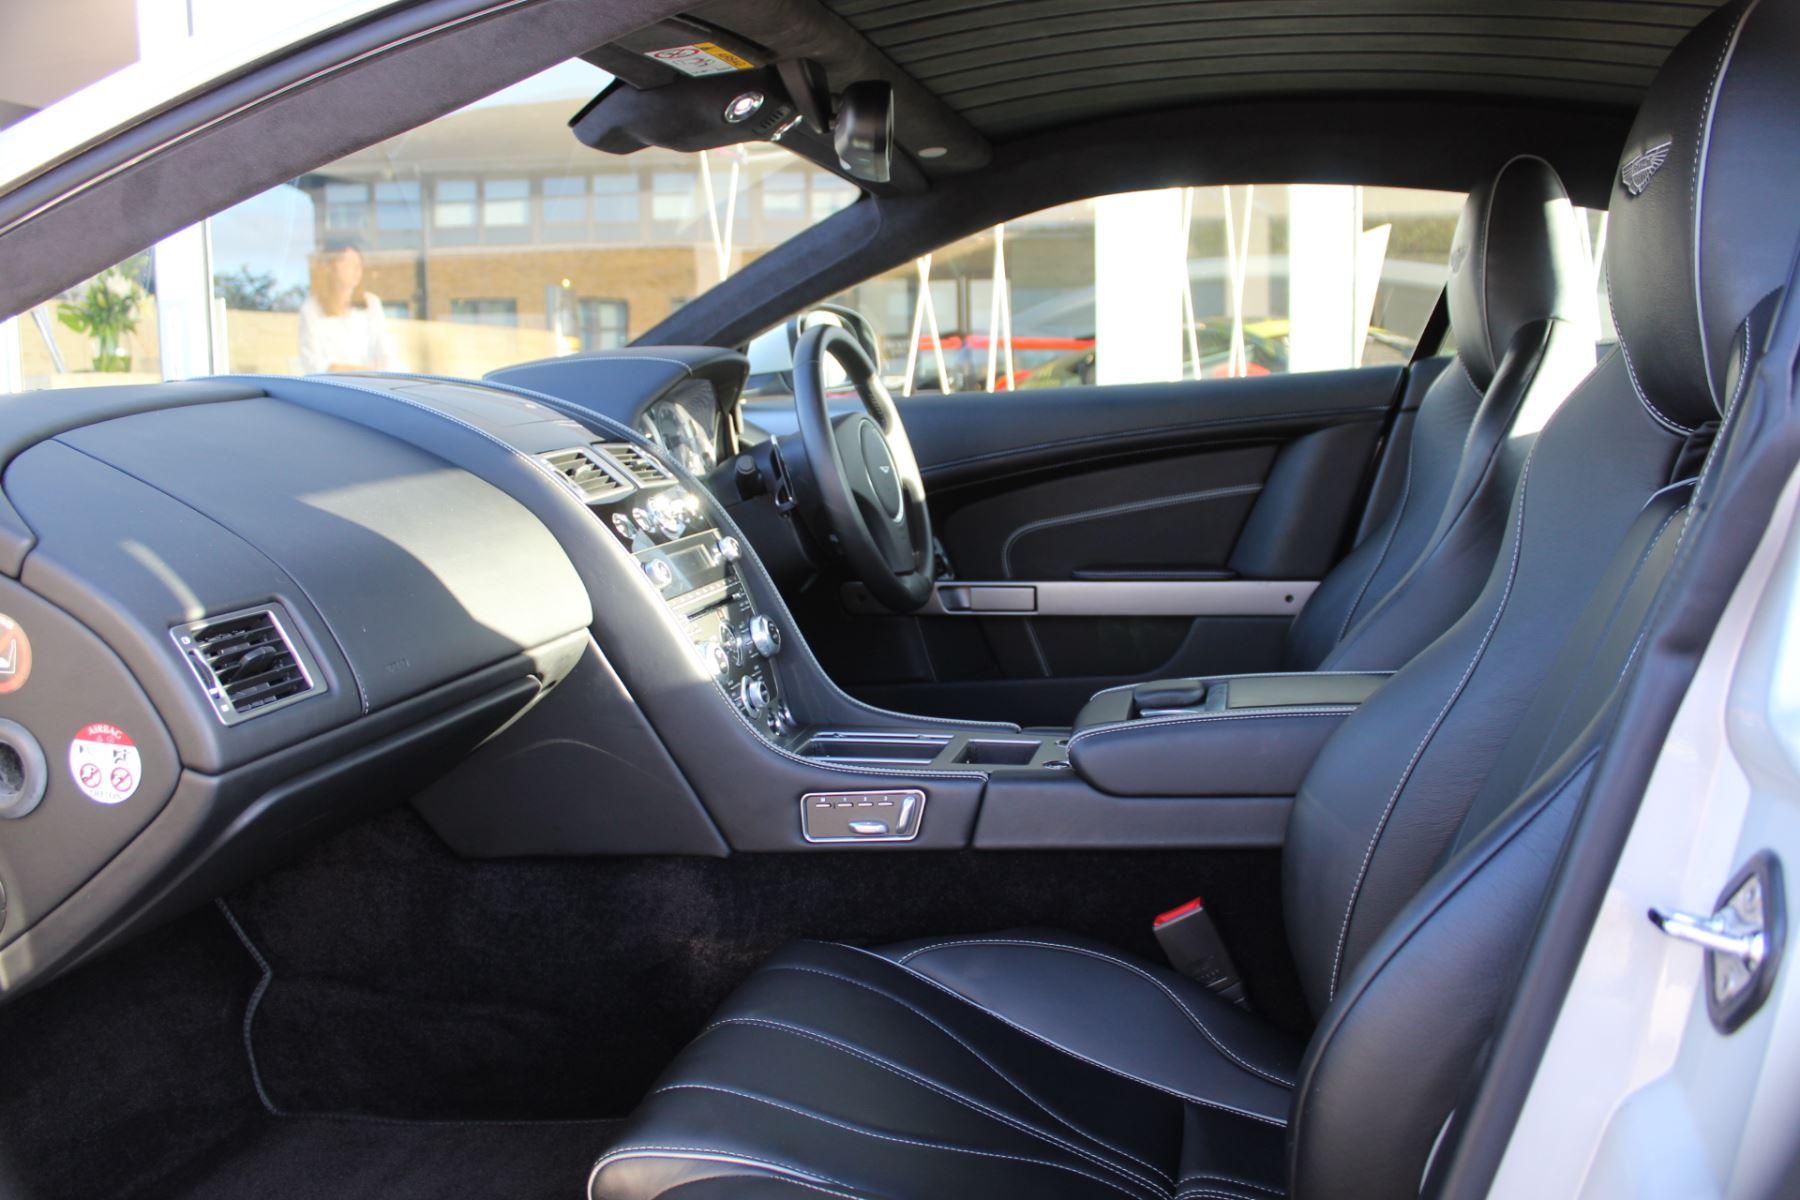 Aston Martin DB9 V12 2dr Touchtronic image 8